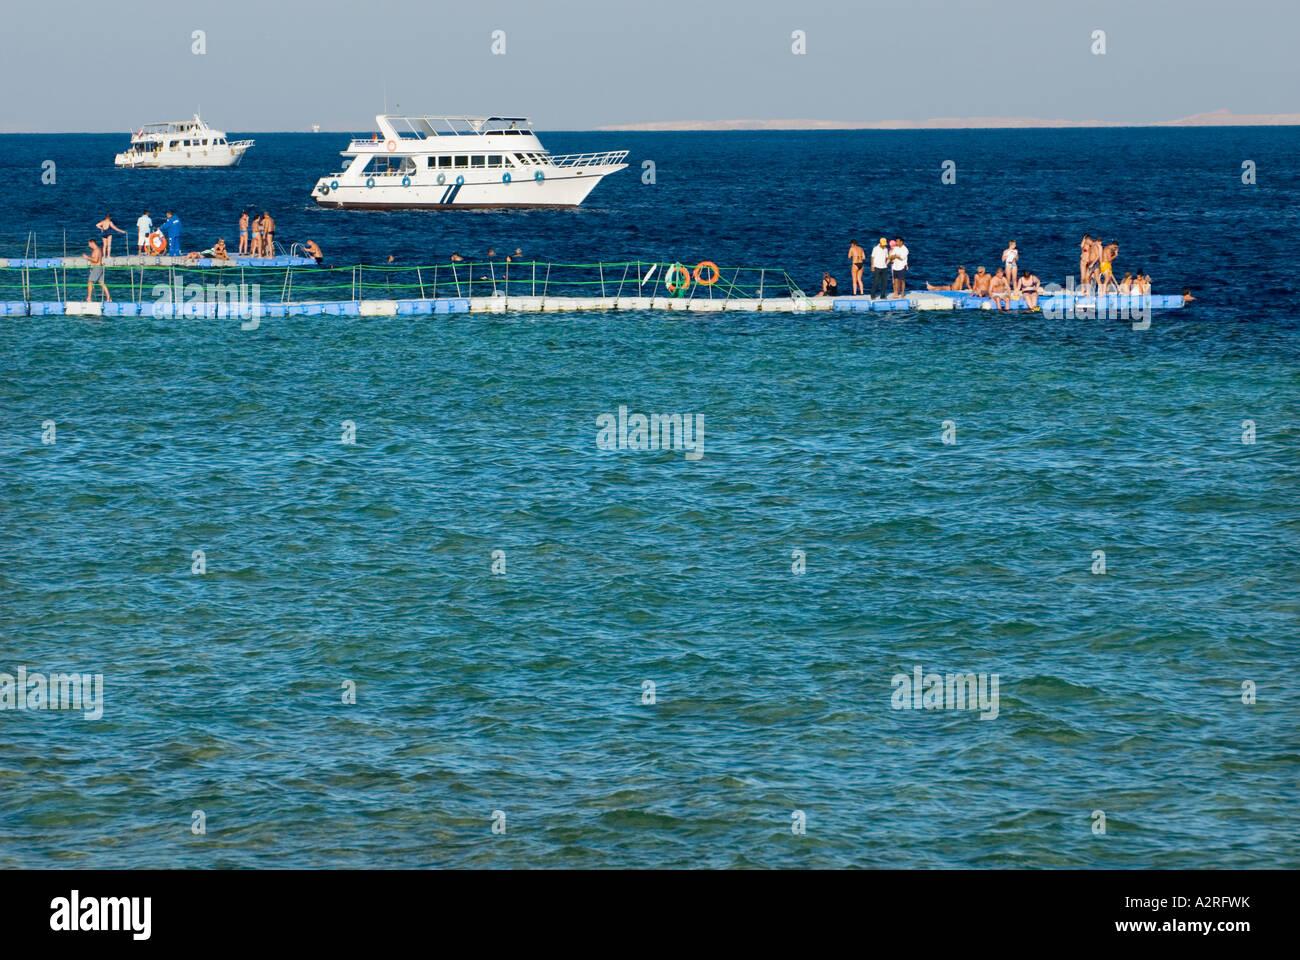 swimming platform base diver  HOUSEREEF house reef riff Sharm El Sheikh EGYPT Om El Sid Plateau people tourists - Stock Image